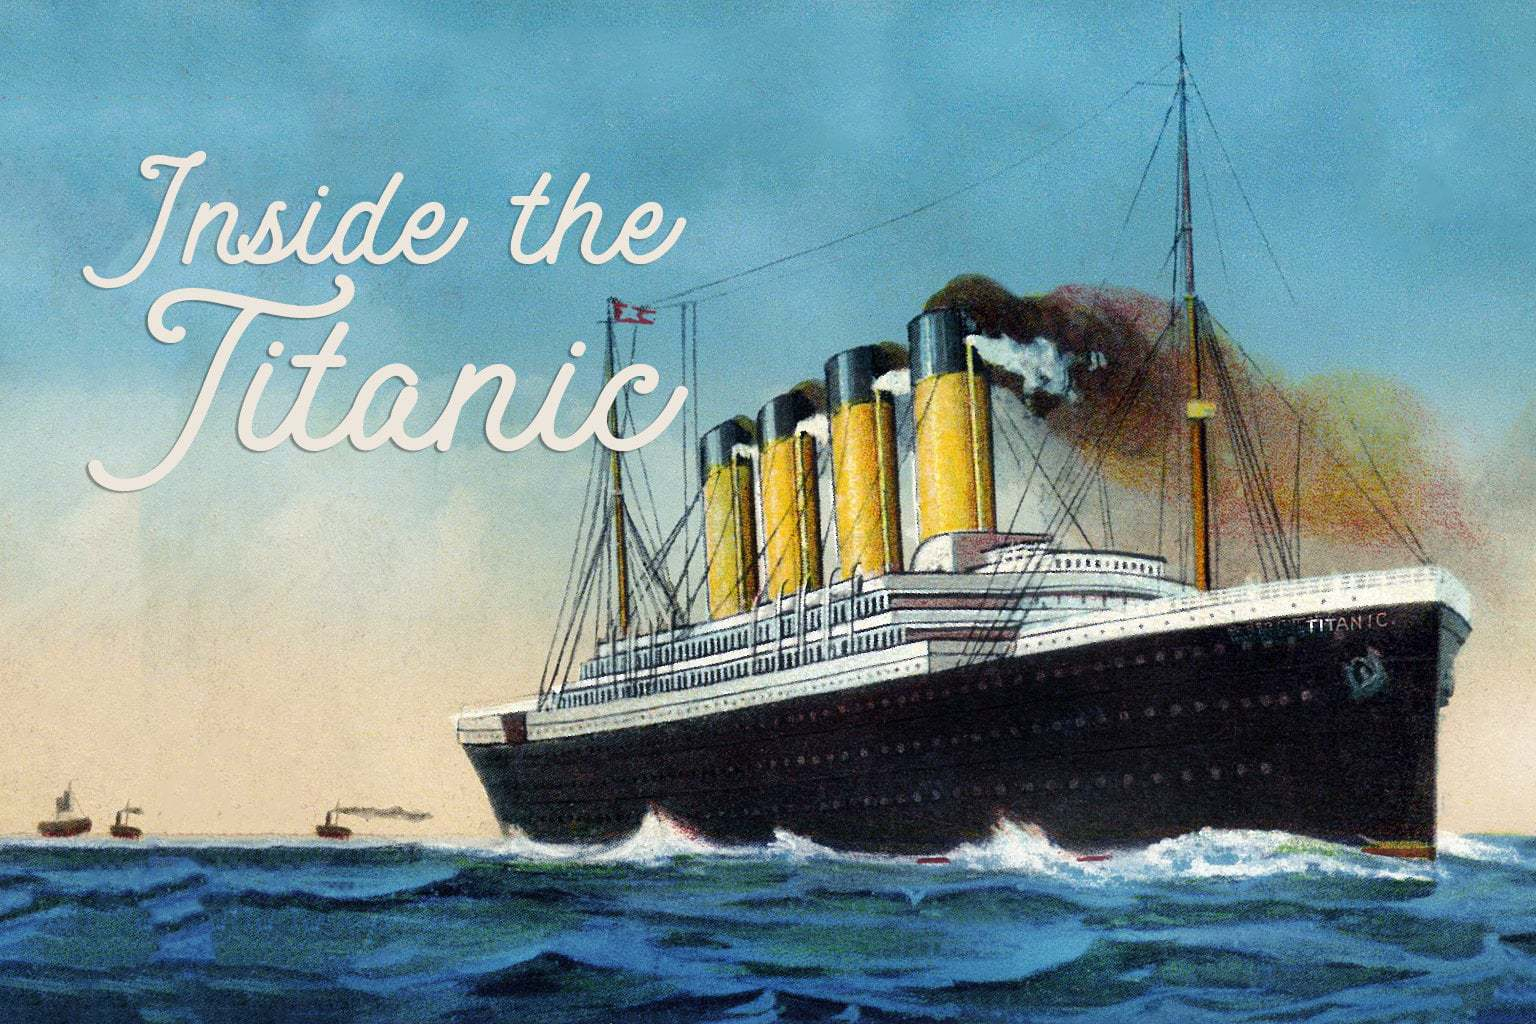 Inside the Titanic - Luxurious doomed ship